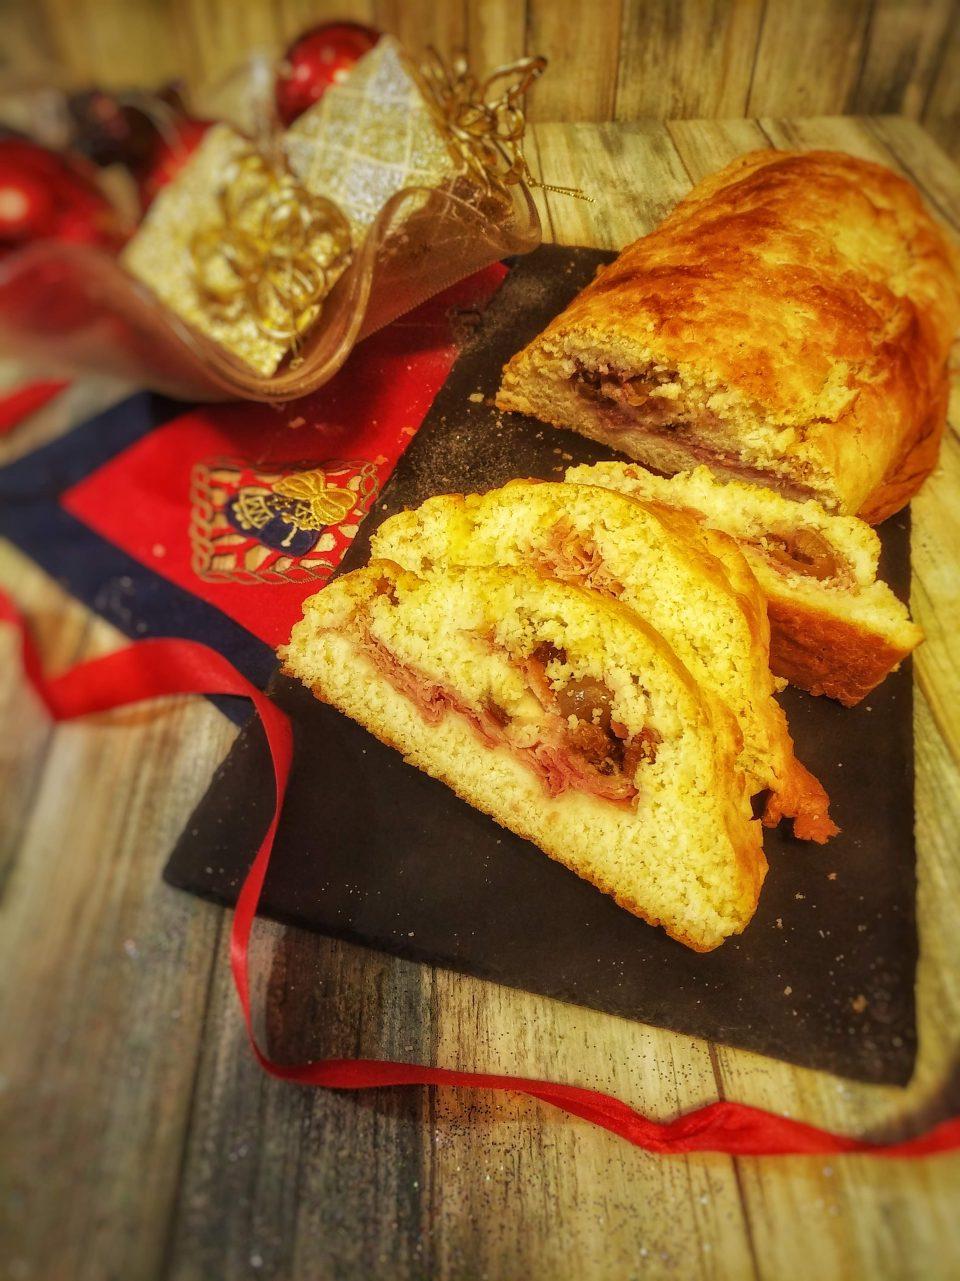 Ricetta pan de jamon Natale in Venezuela ViaggiandoMangiando